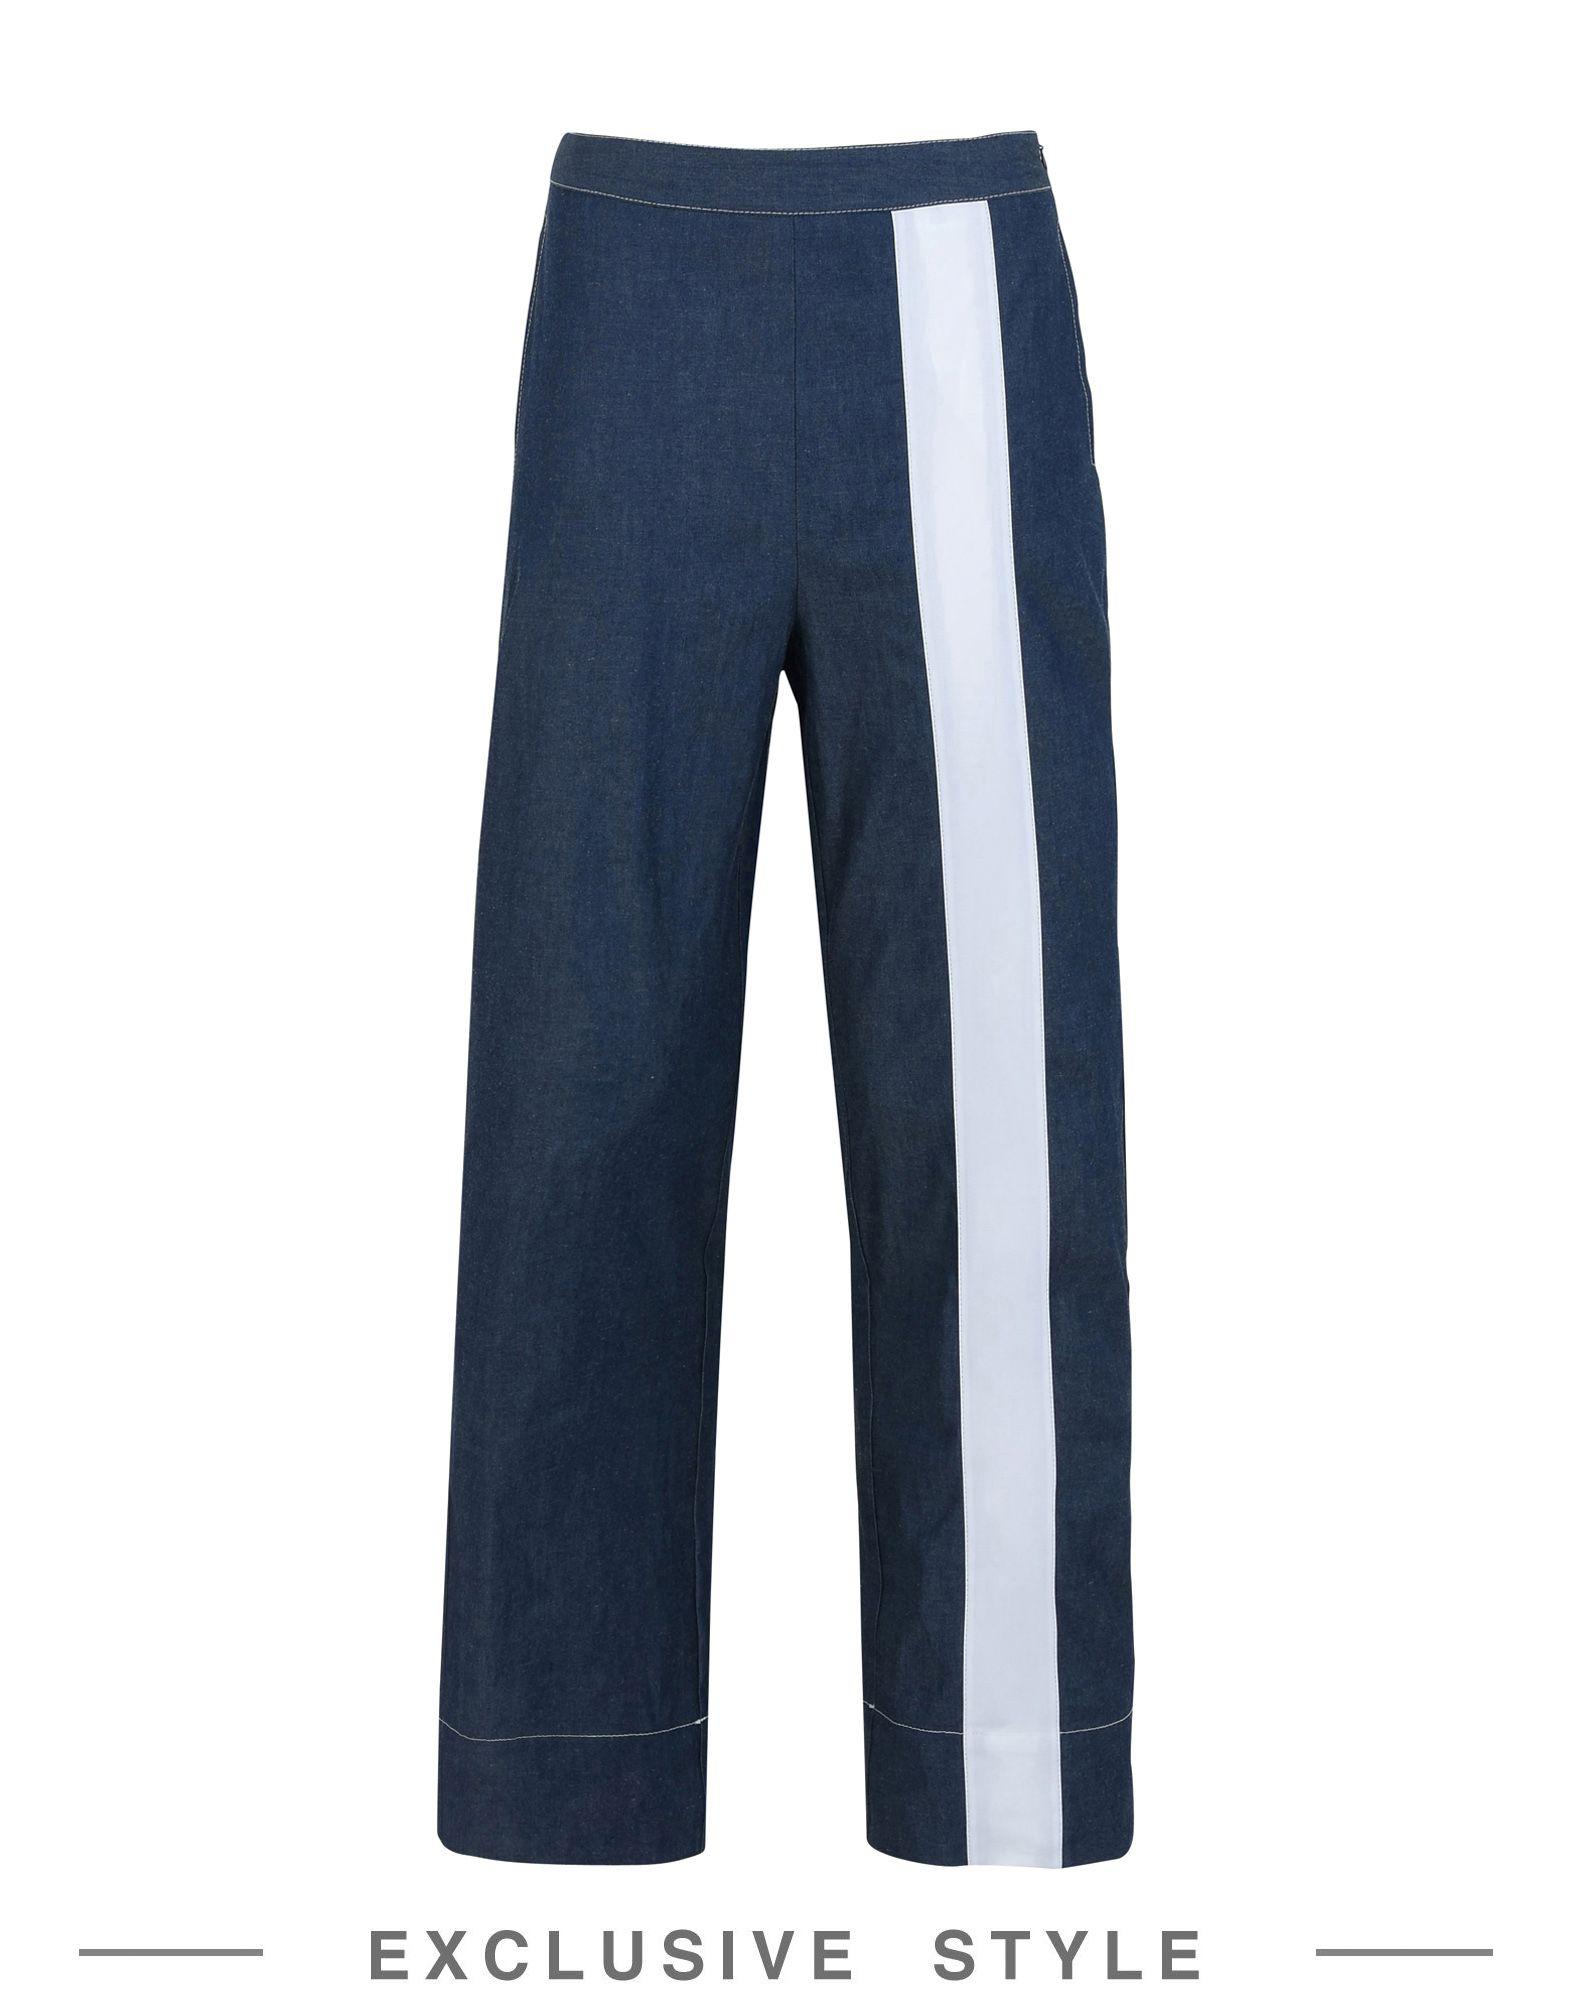 JI WON CHOI x YOOX Джинсовые брюки